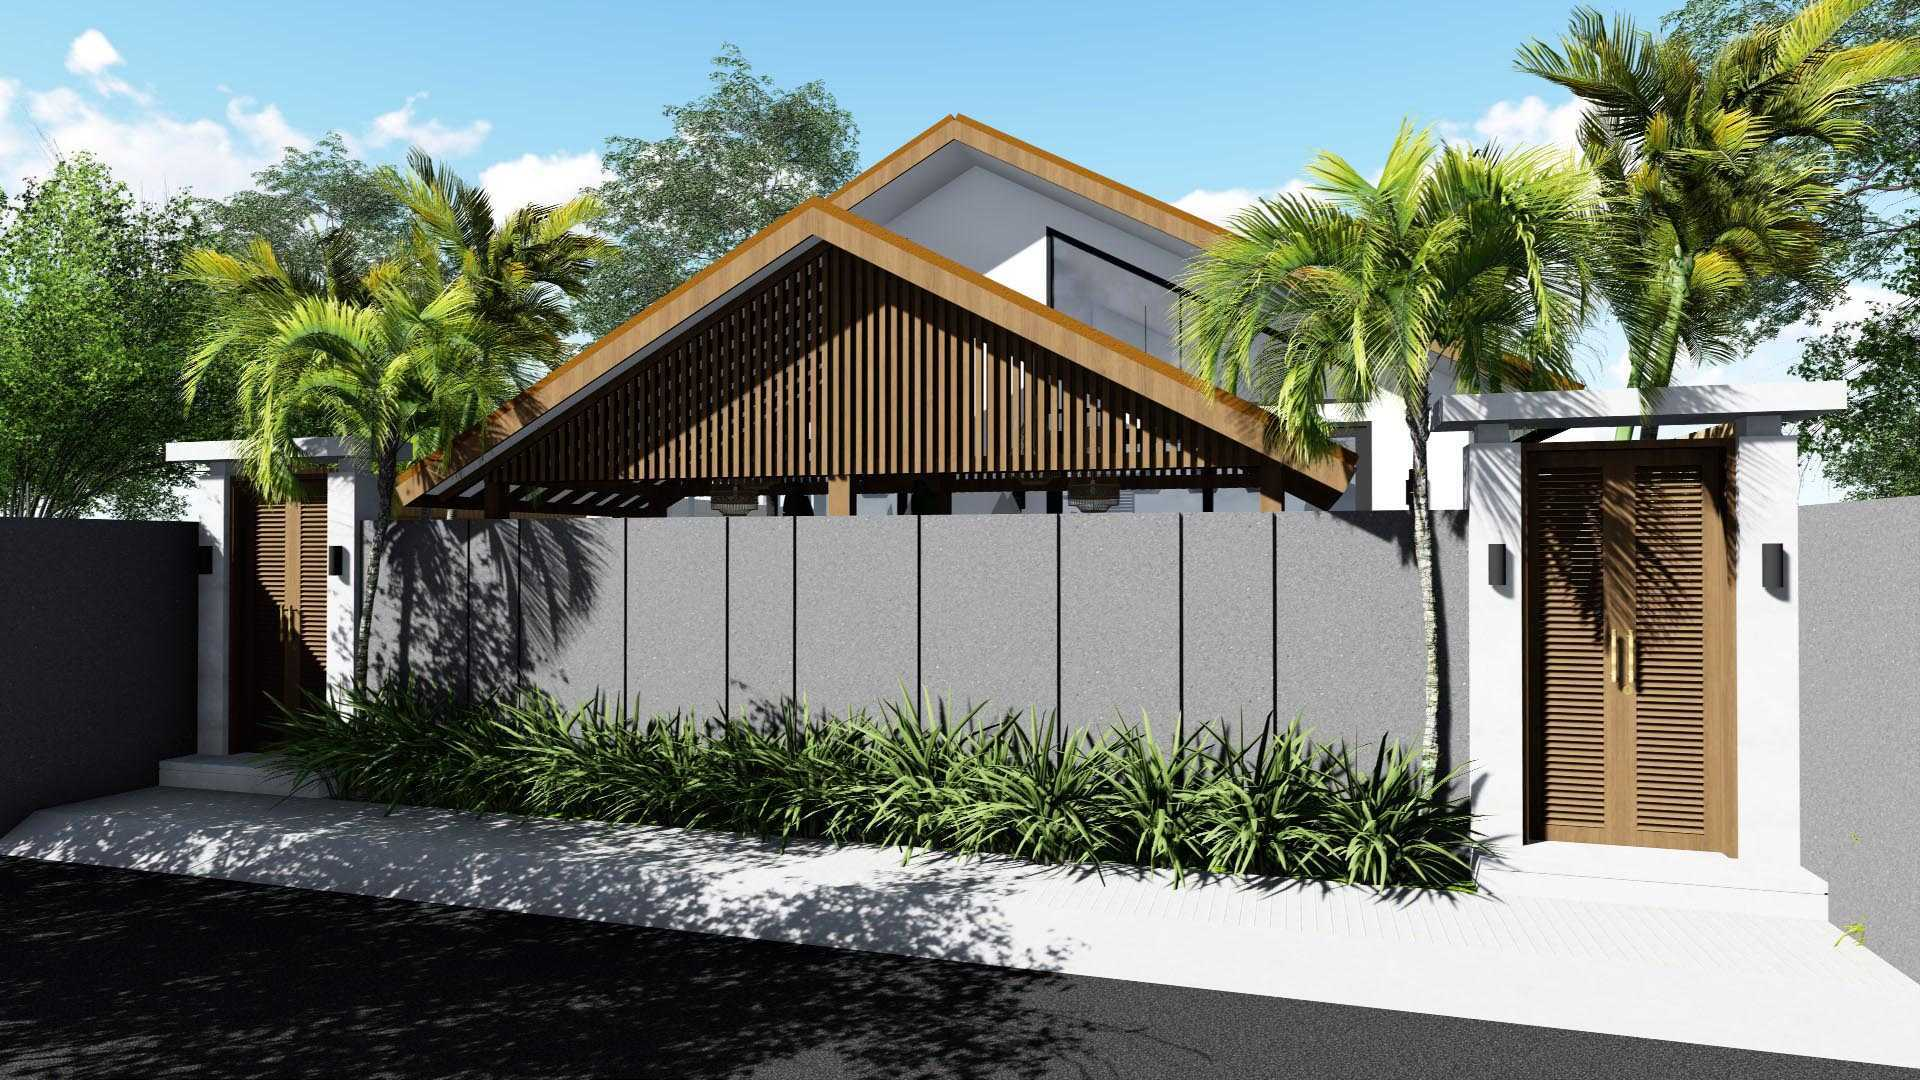 Revan Teggar Md Surf Studio Uluwatu Beach, Pecatu, South Kuta, Badung Regency, Bali 80361, Indonesia Uluwatu Beach, Pecatu, South Kuta, Badung Regency, Bali 80361, Indonesia Revan-Teggar-Md-Surf-Studio   129731